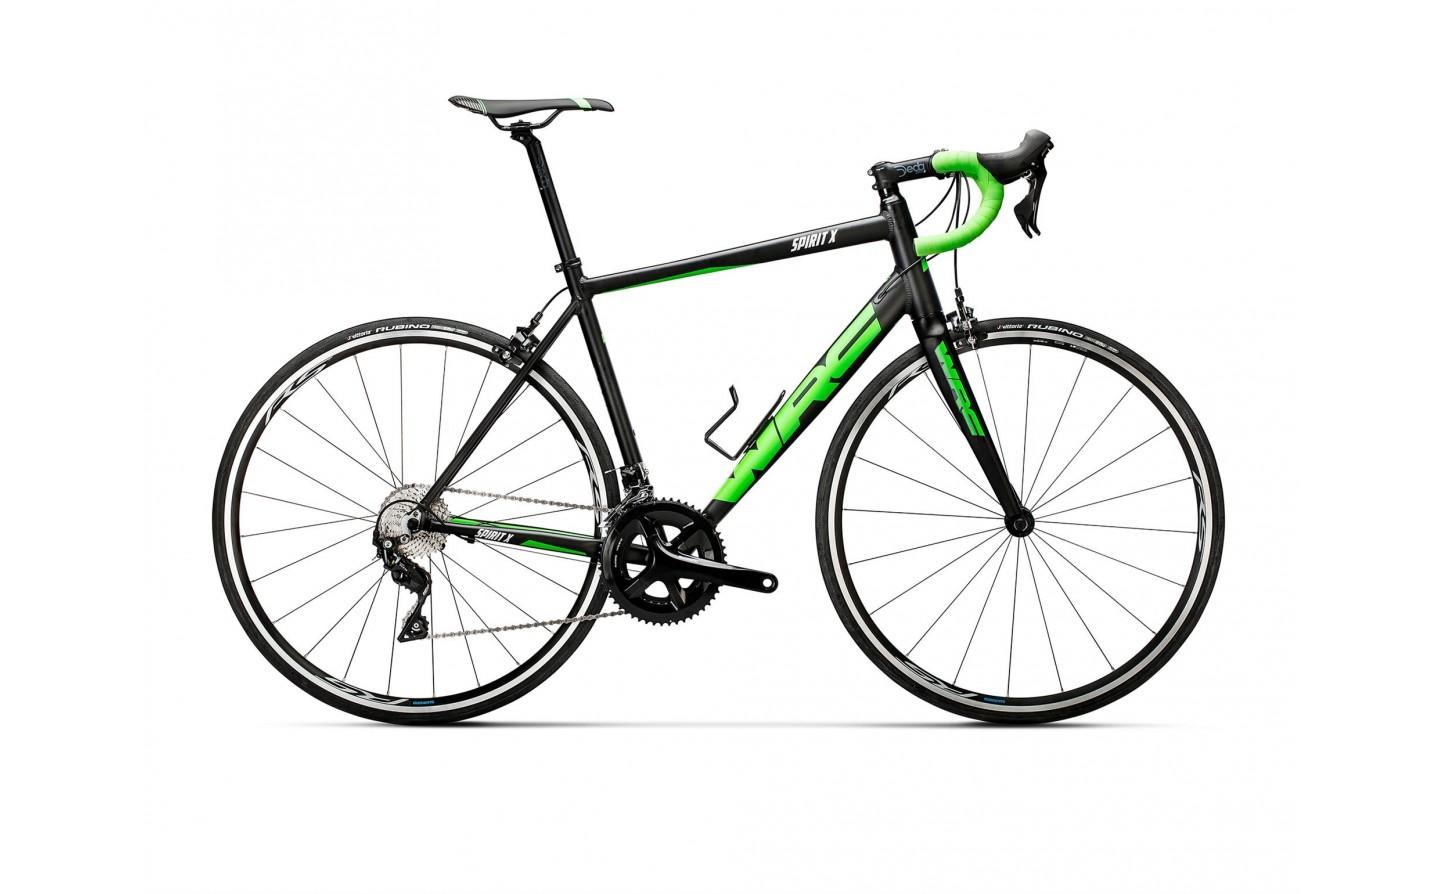 Bicicleta Conor Wrc Spirit X 105